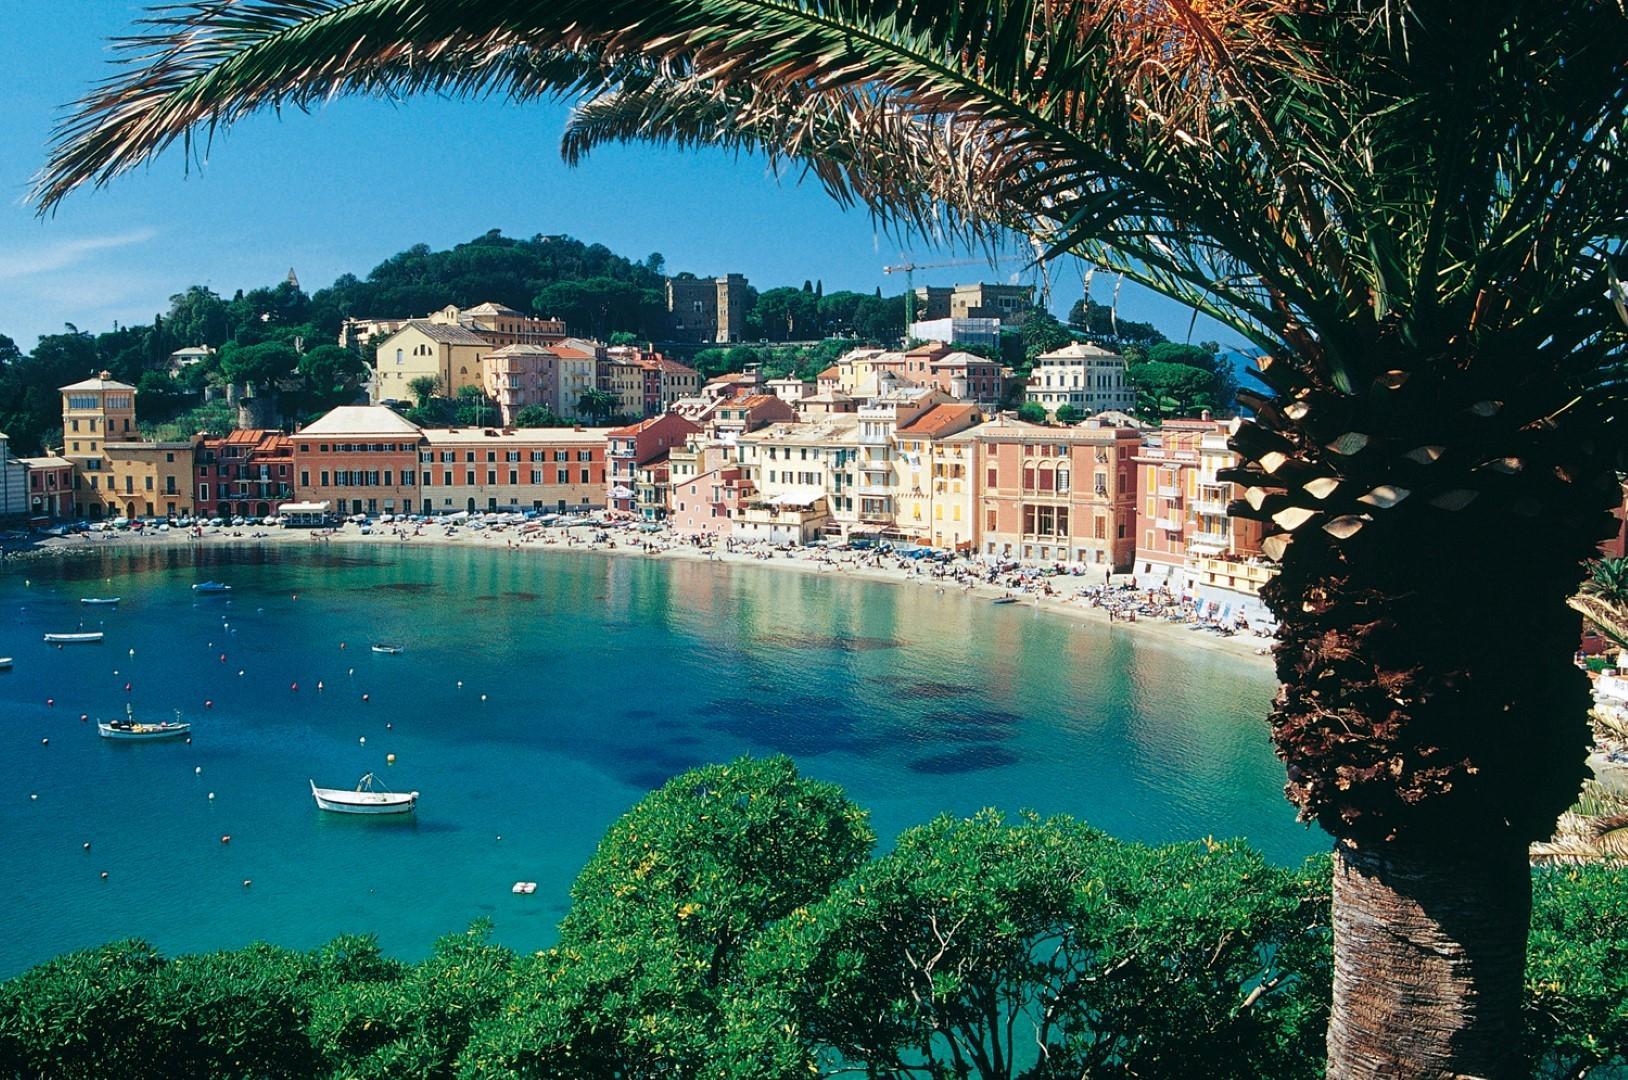 Avventure, bici e gelati: è la Liguria kid frendly